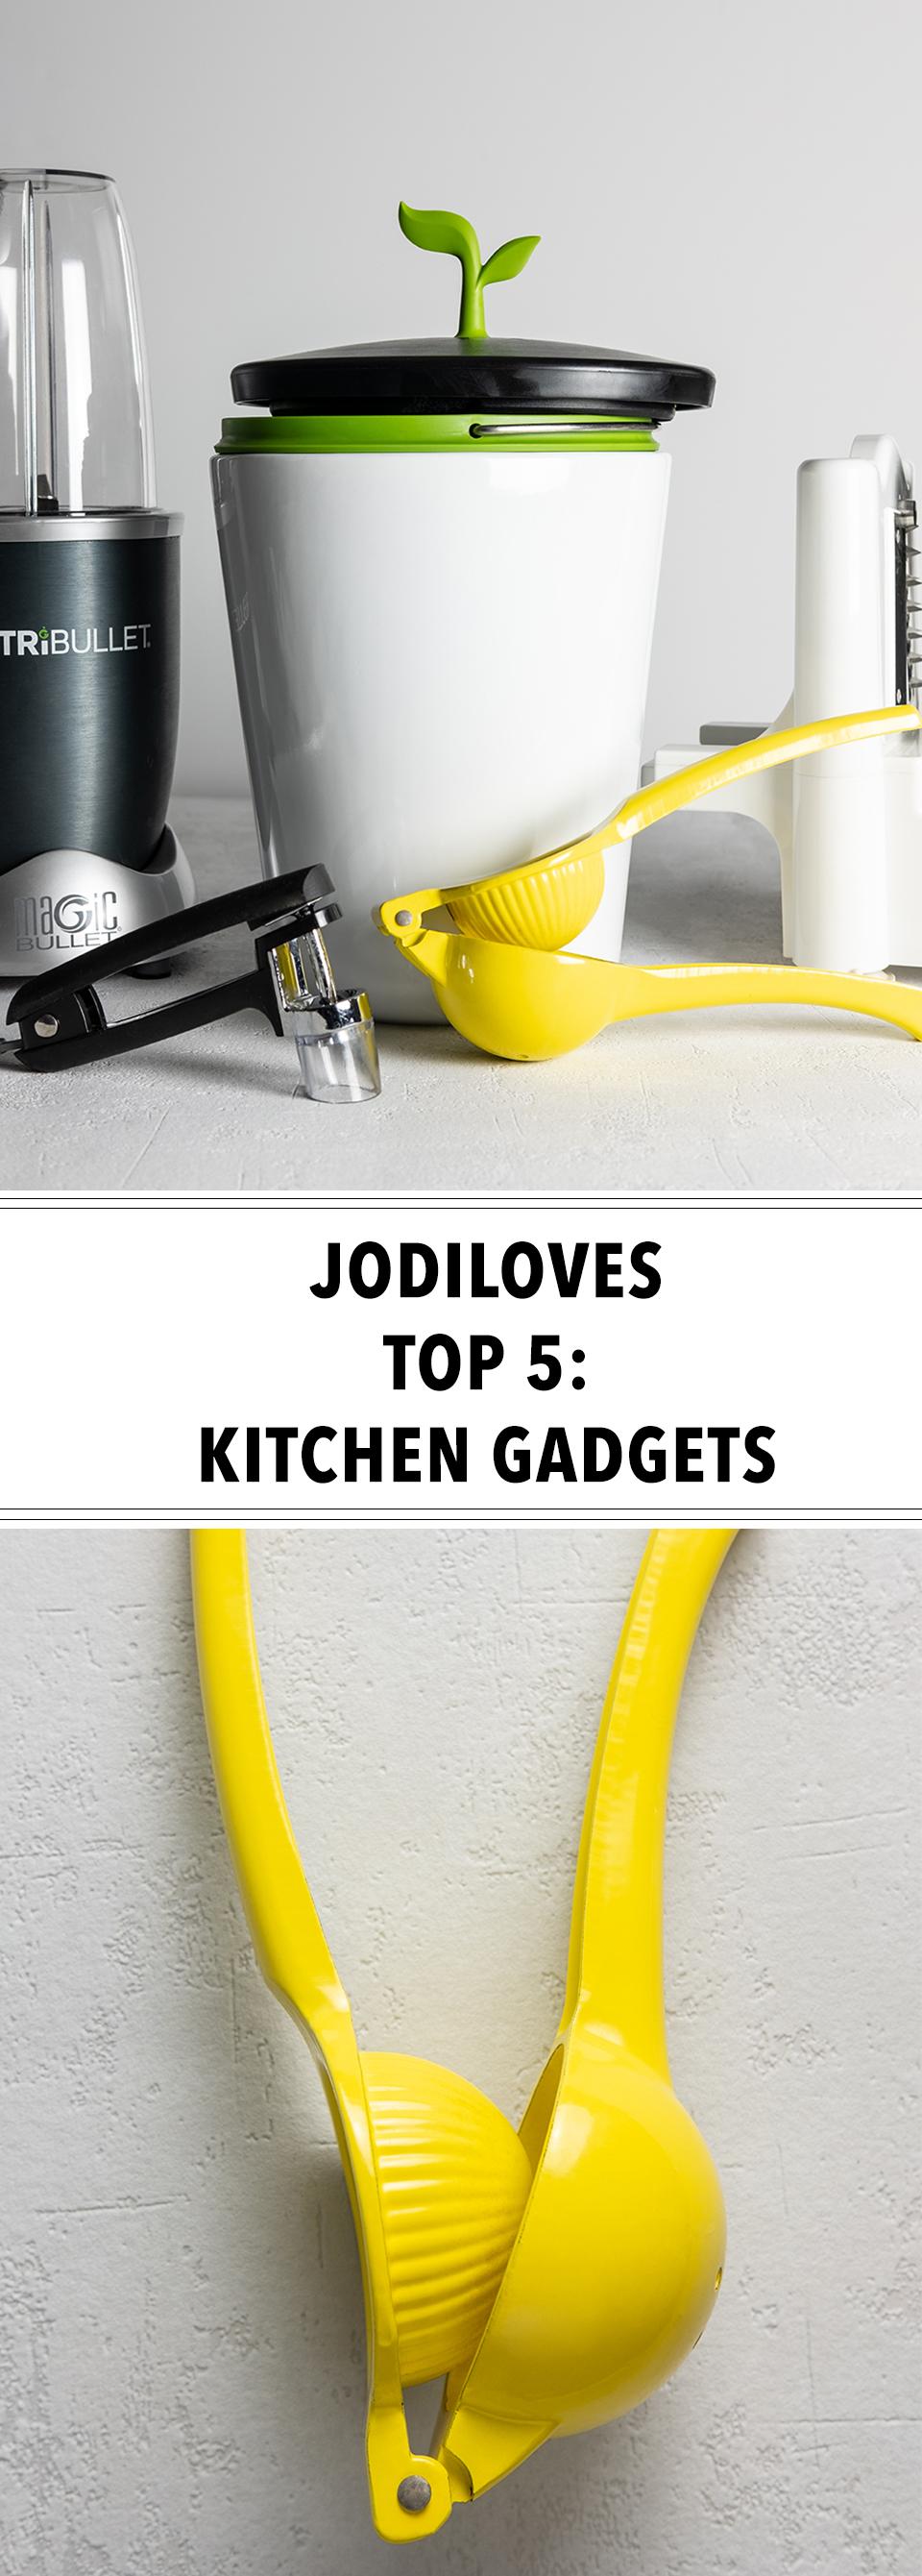 JodiLoves_Retouching_Brilliant_Pixel_Imaging-top5-kitchen-gadgets.jpg